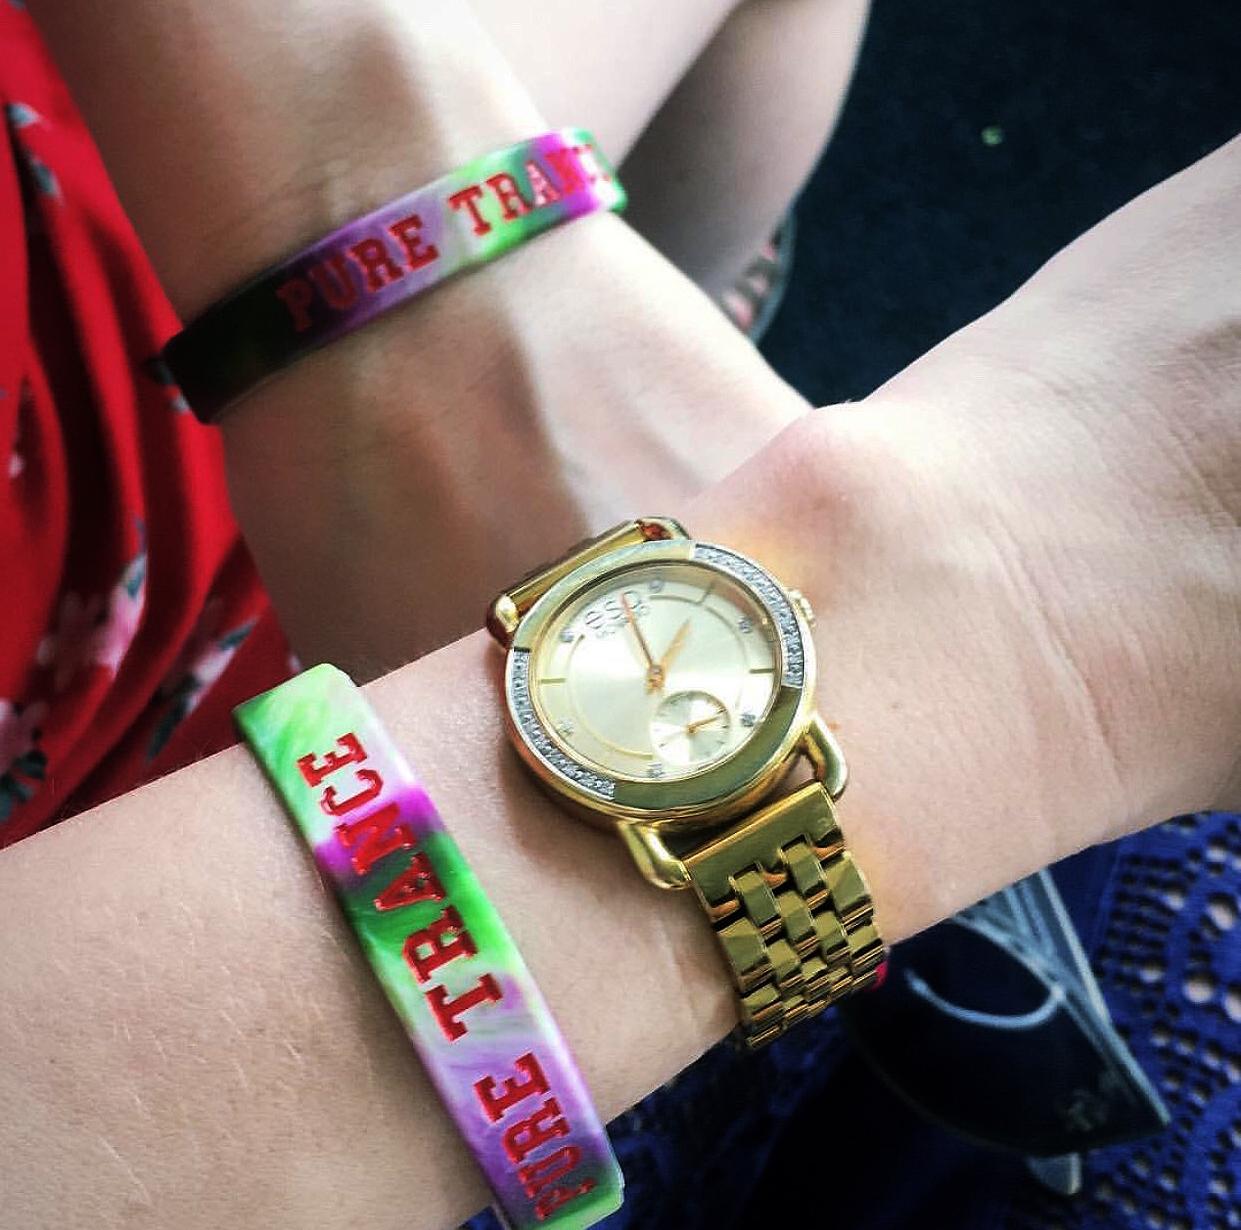 Katie_Kerl_blogger_Miami_trance_nightclub_watch